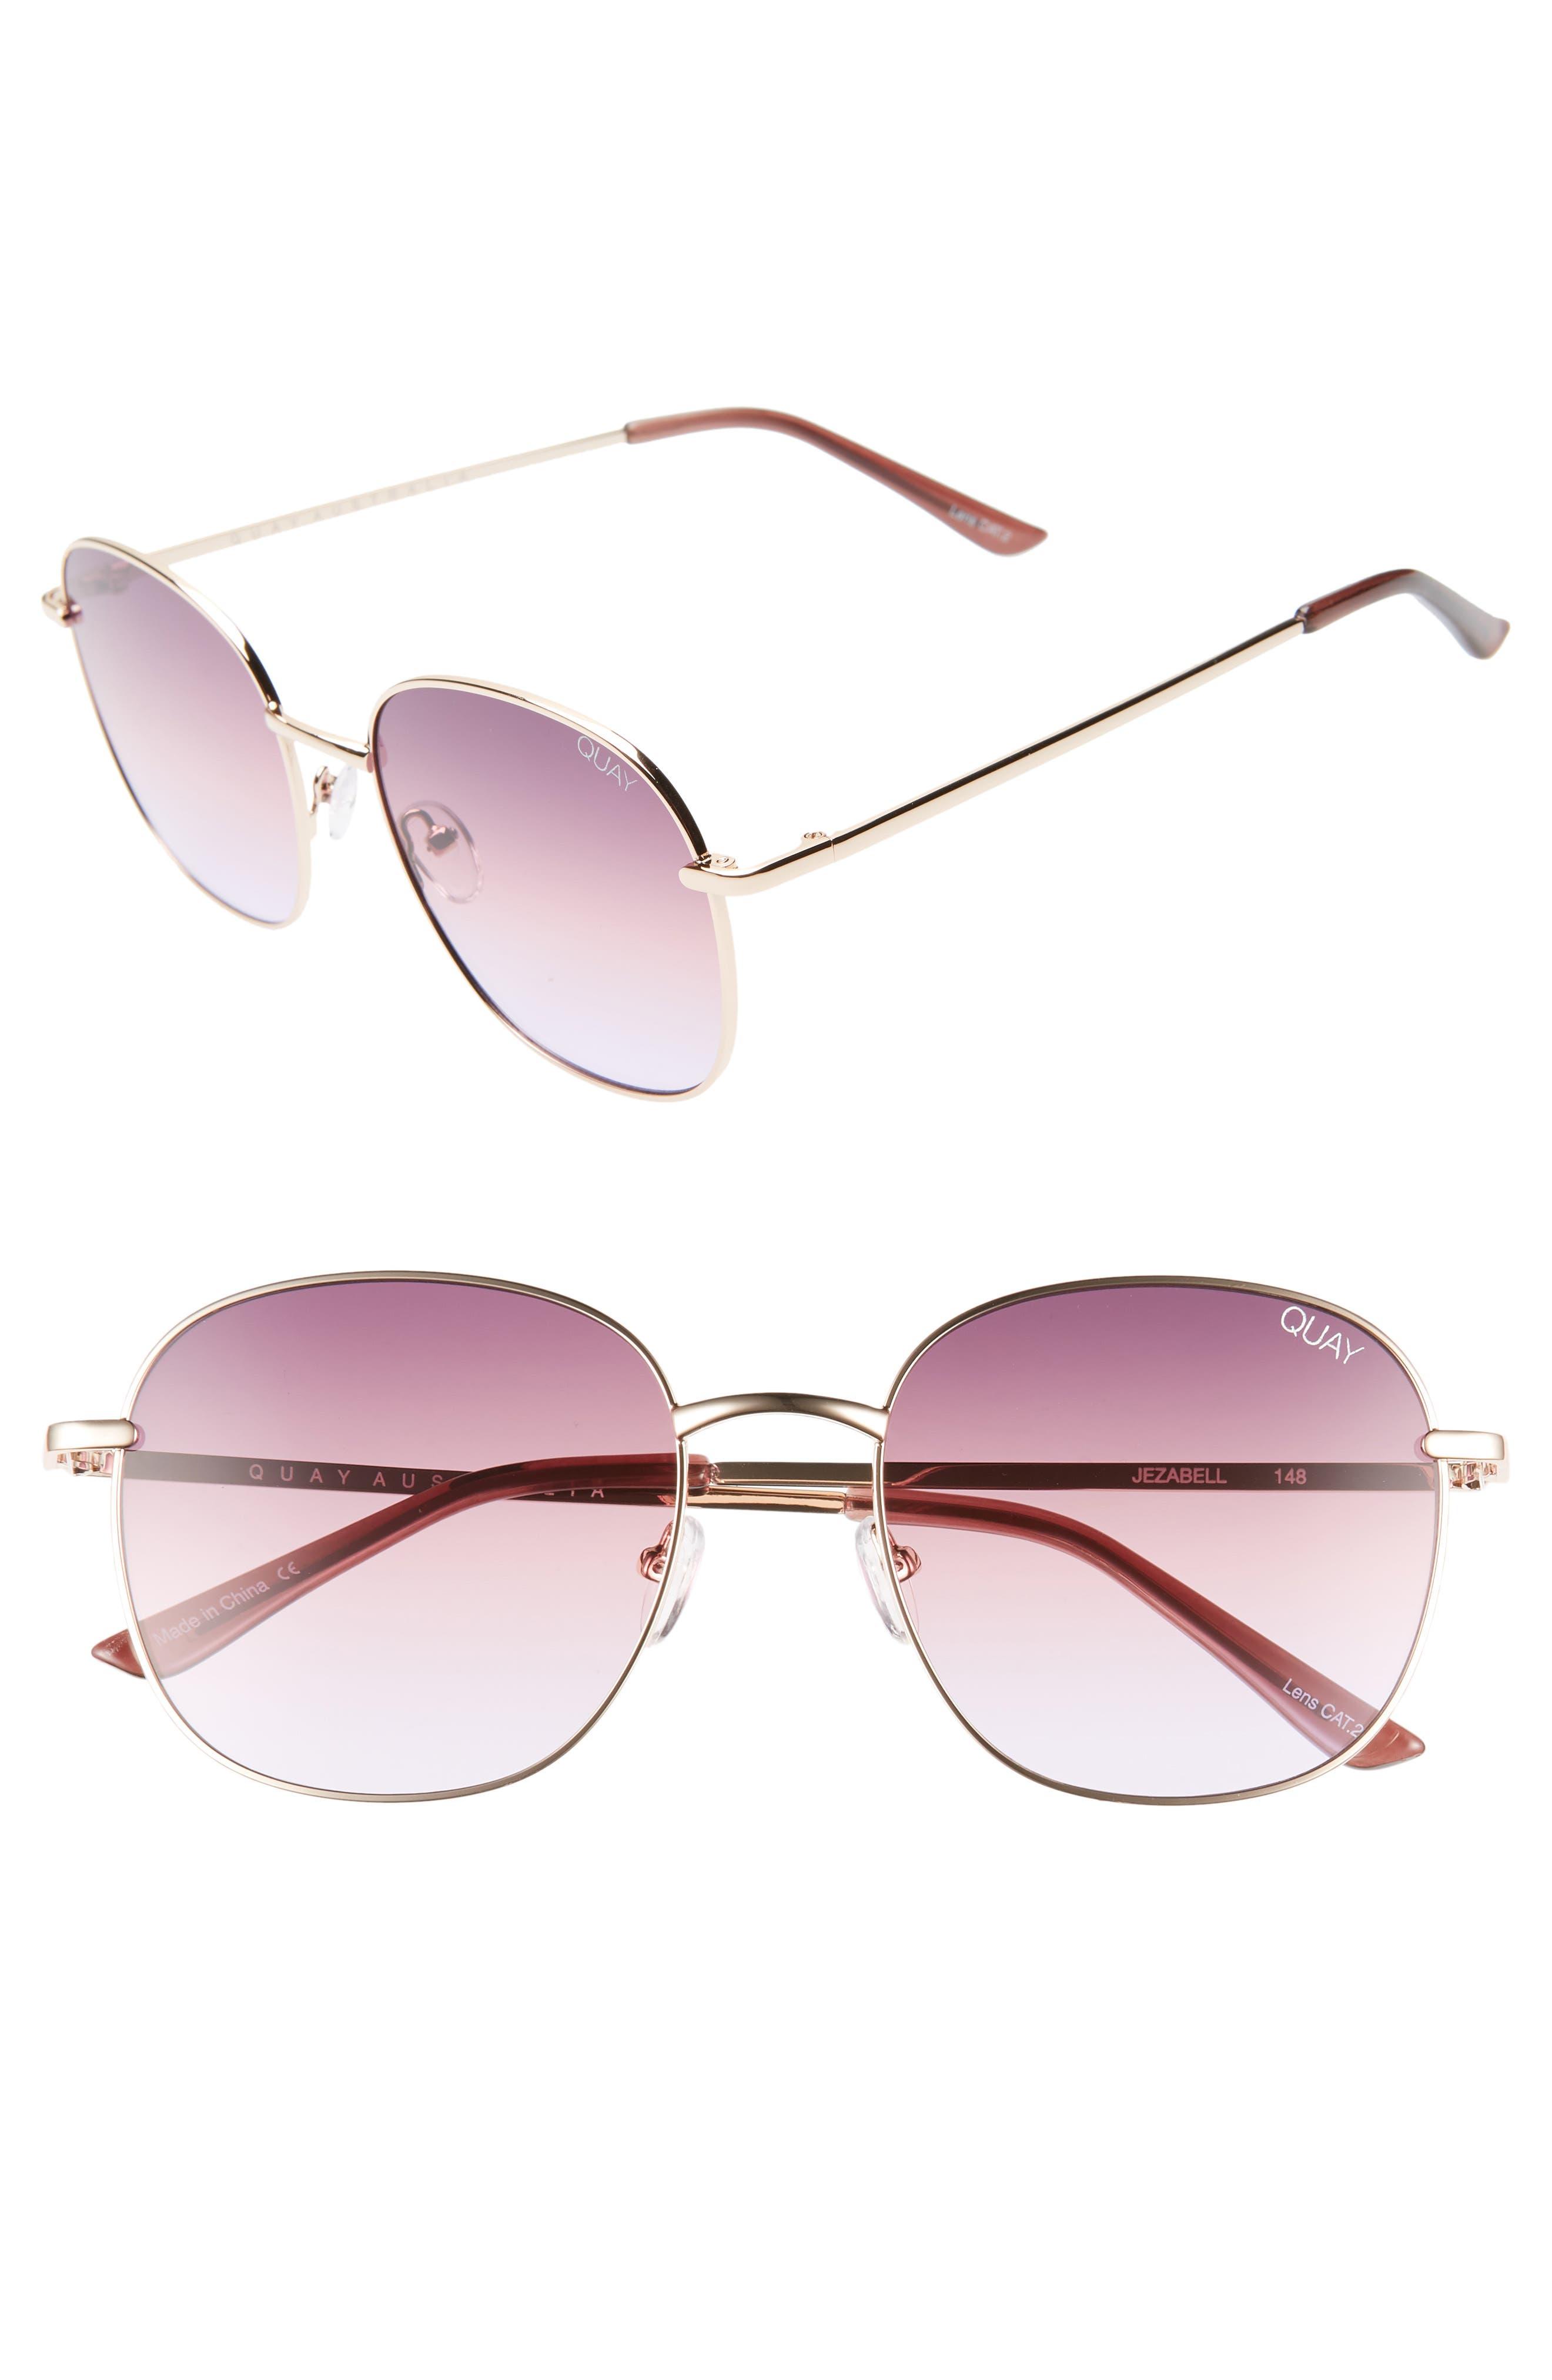 Quay Australia Jezabell 57Mm Round Sunglasses - Rose / Purple Pink Fade